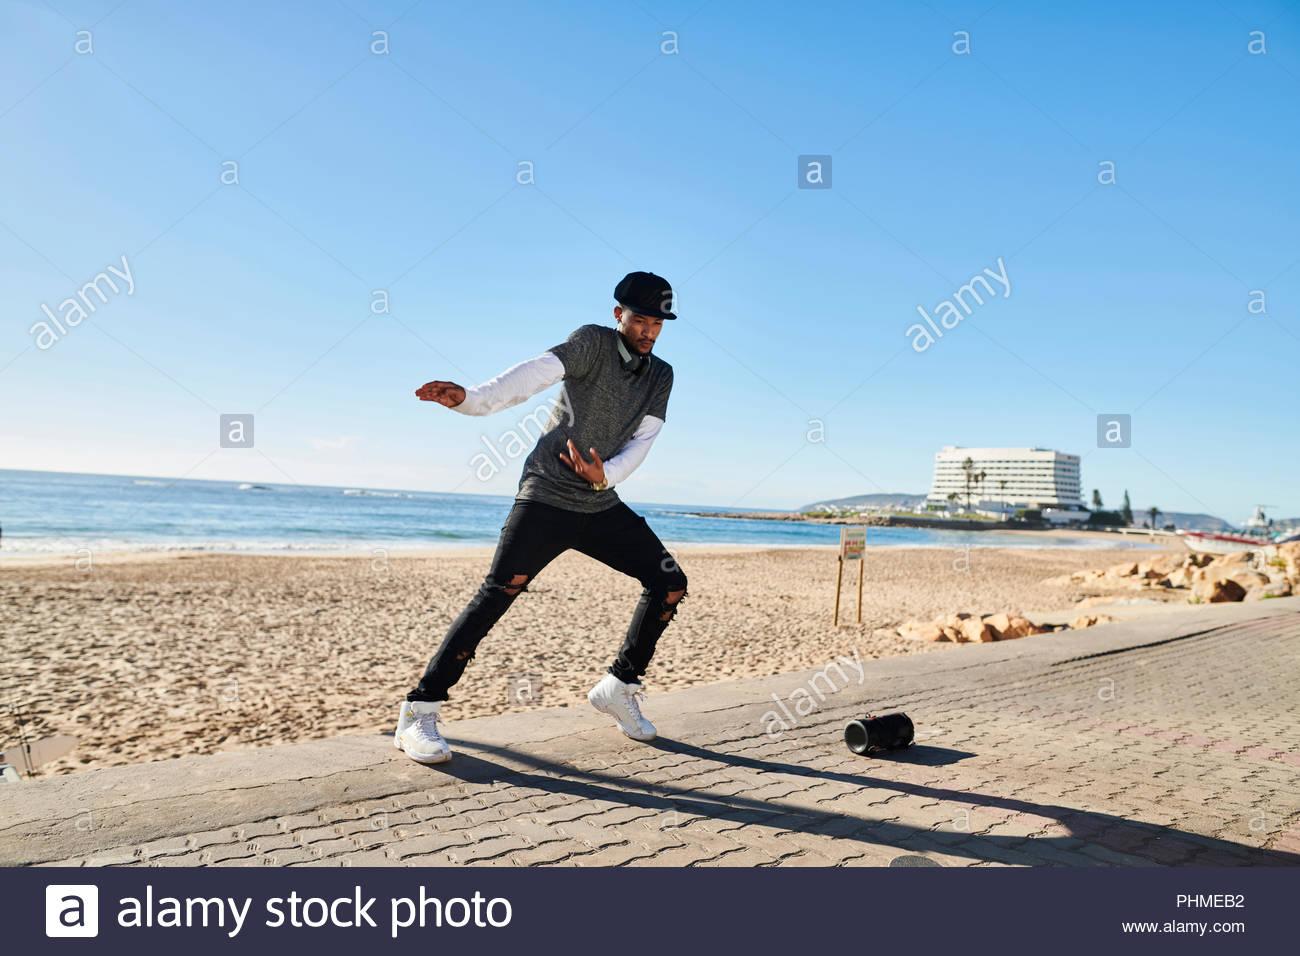 Young man break dancing by beach - Stock Image